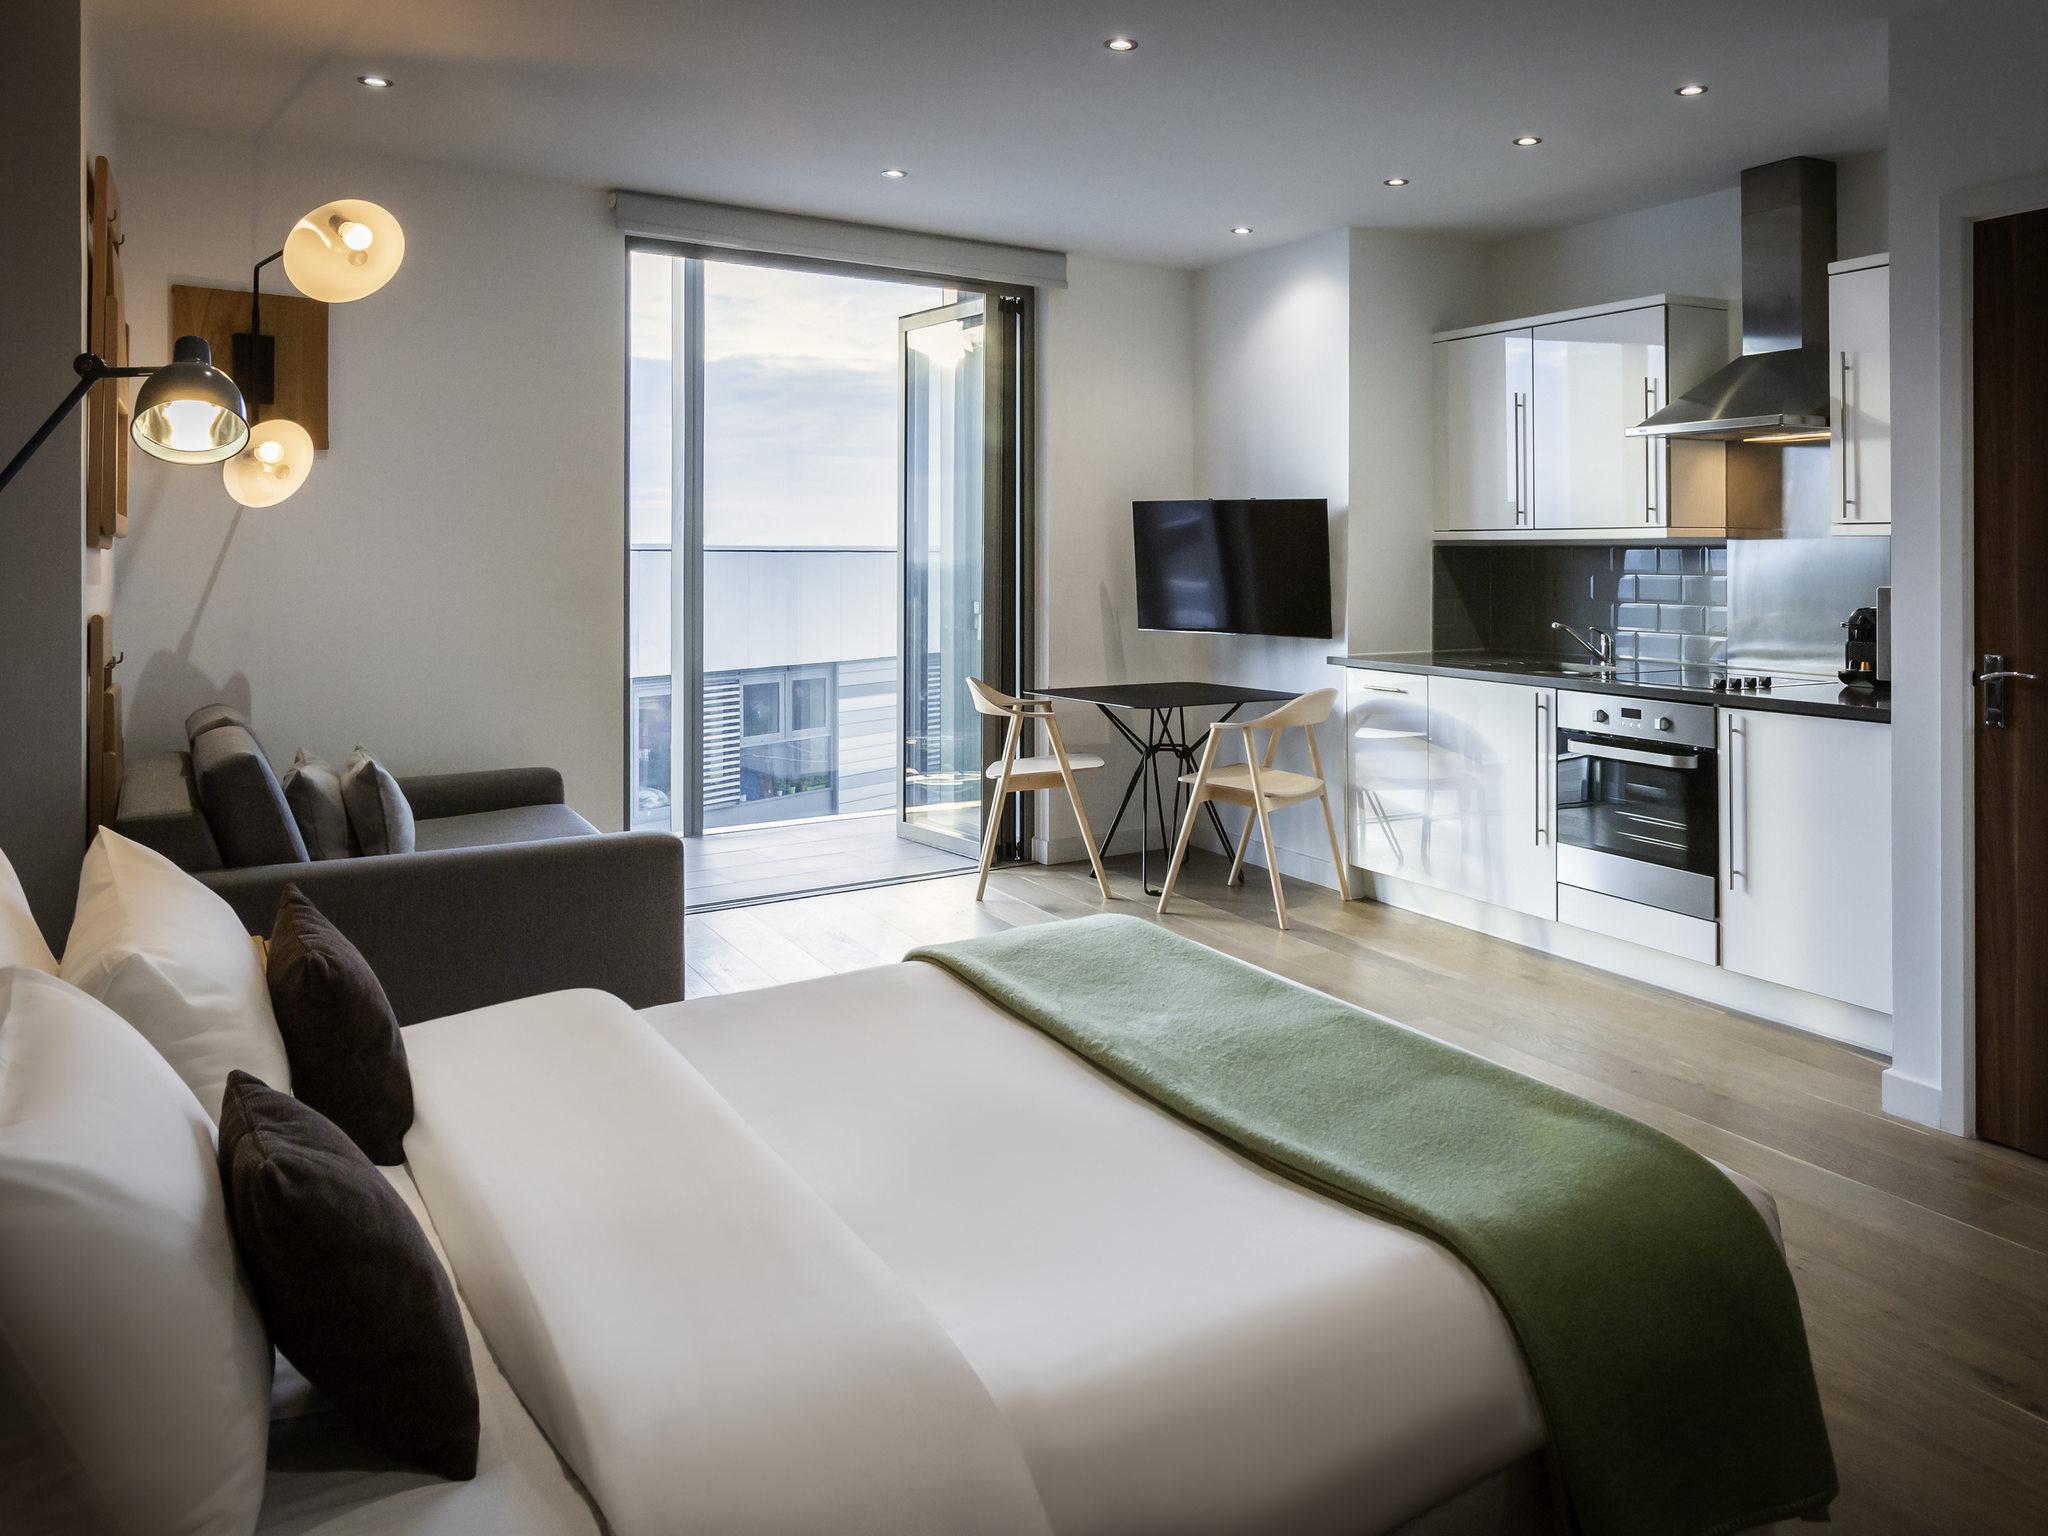 Otel – Aparthotel Adagio London Brentford (Açılış: Ekim 2018)